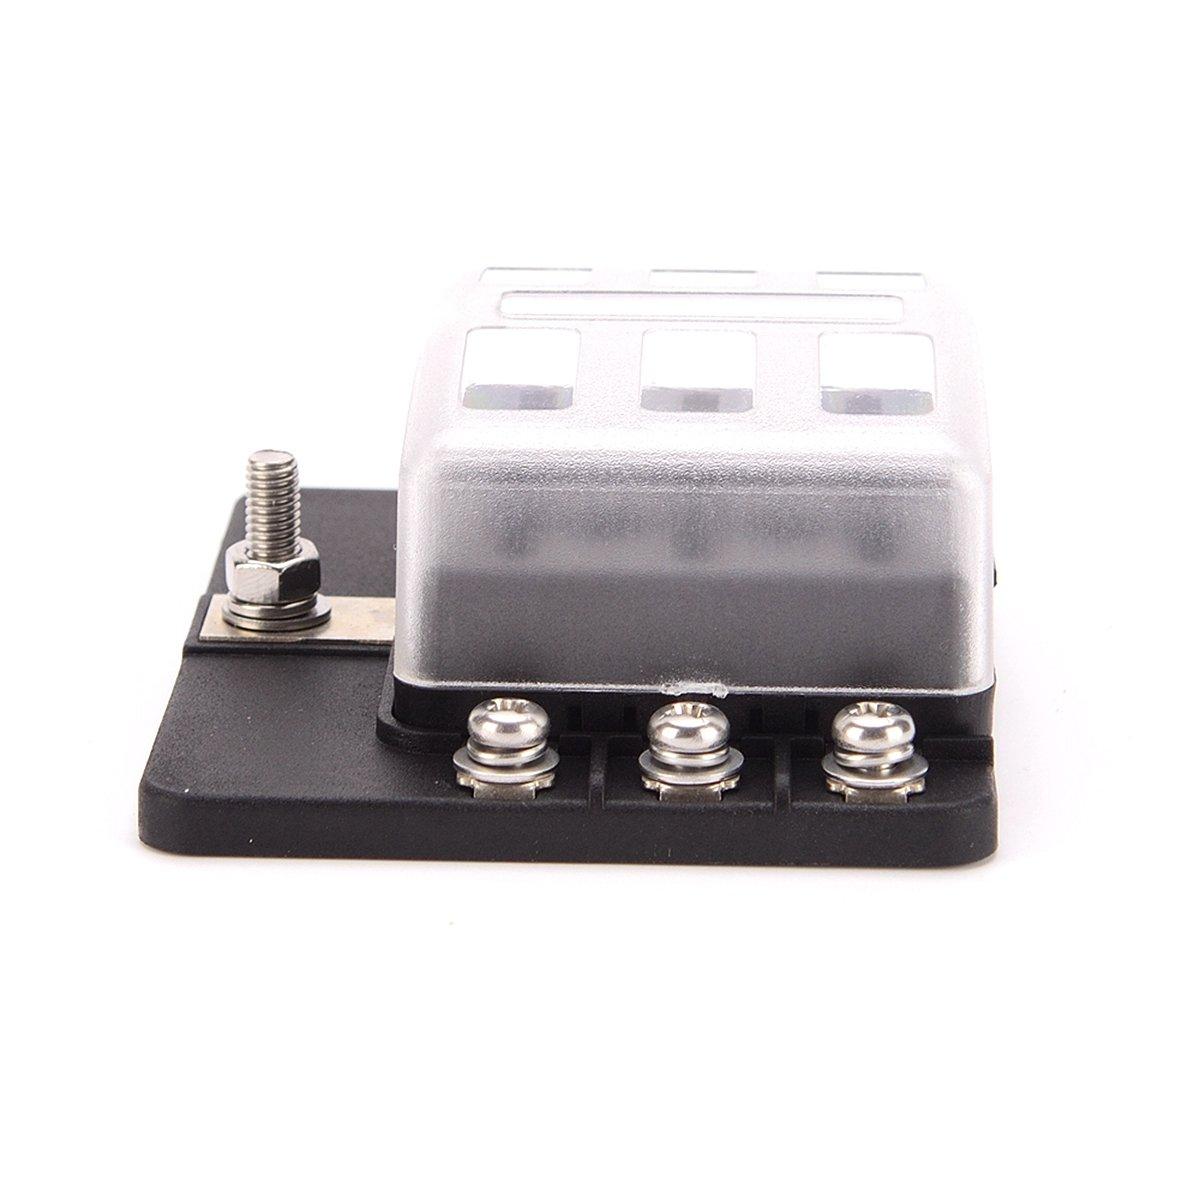 Iztoss 12 Circuit LED Fuse Block Blade Fuse Box with screw terminal block single plastic bag for Car Boat Marine Trike